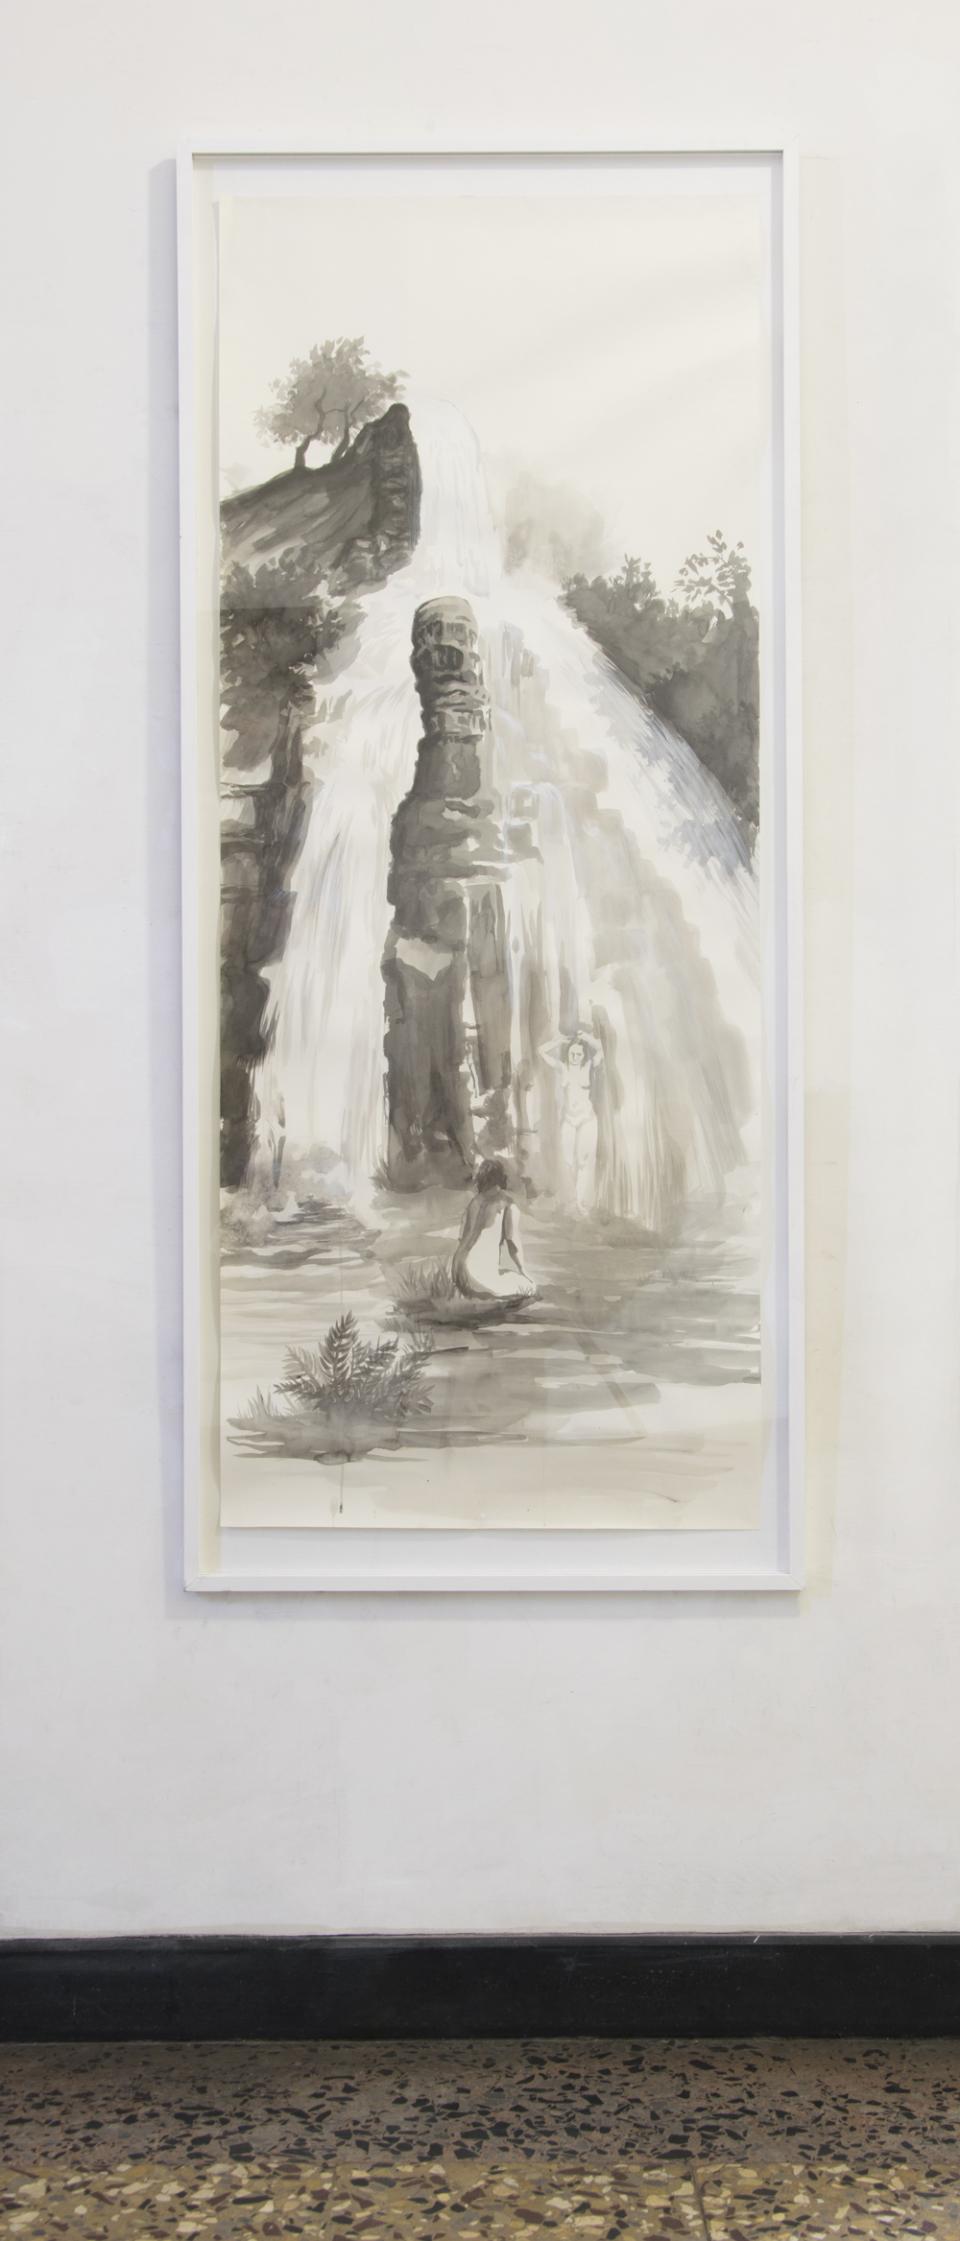 © Kathrin Edwards, cascade, ink on paper, 70x177cm, 2018